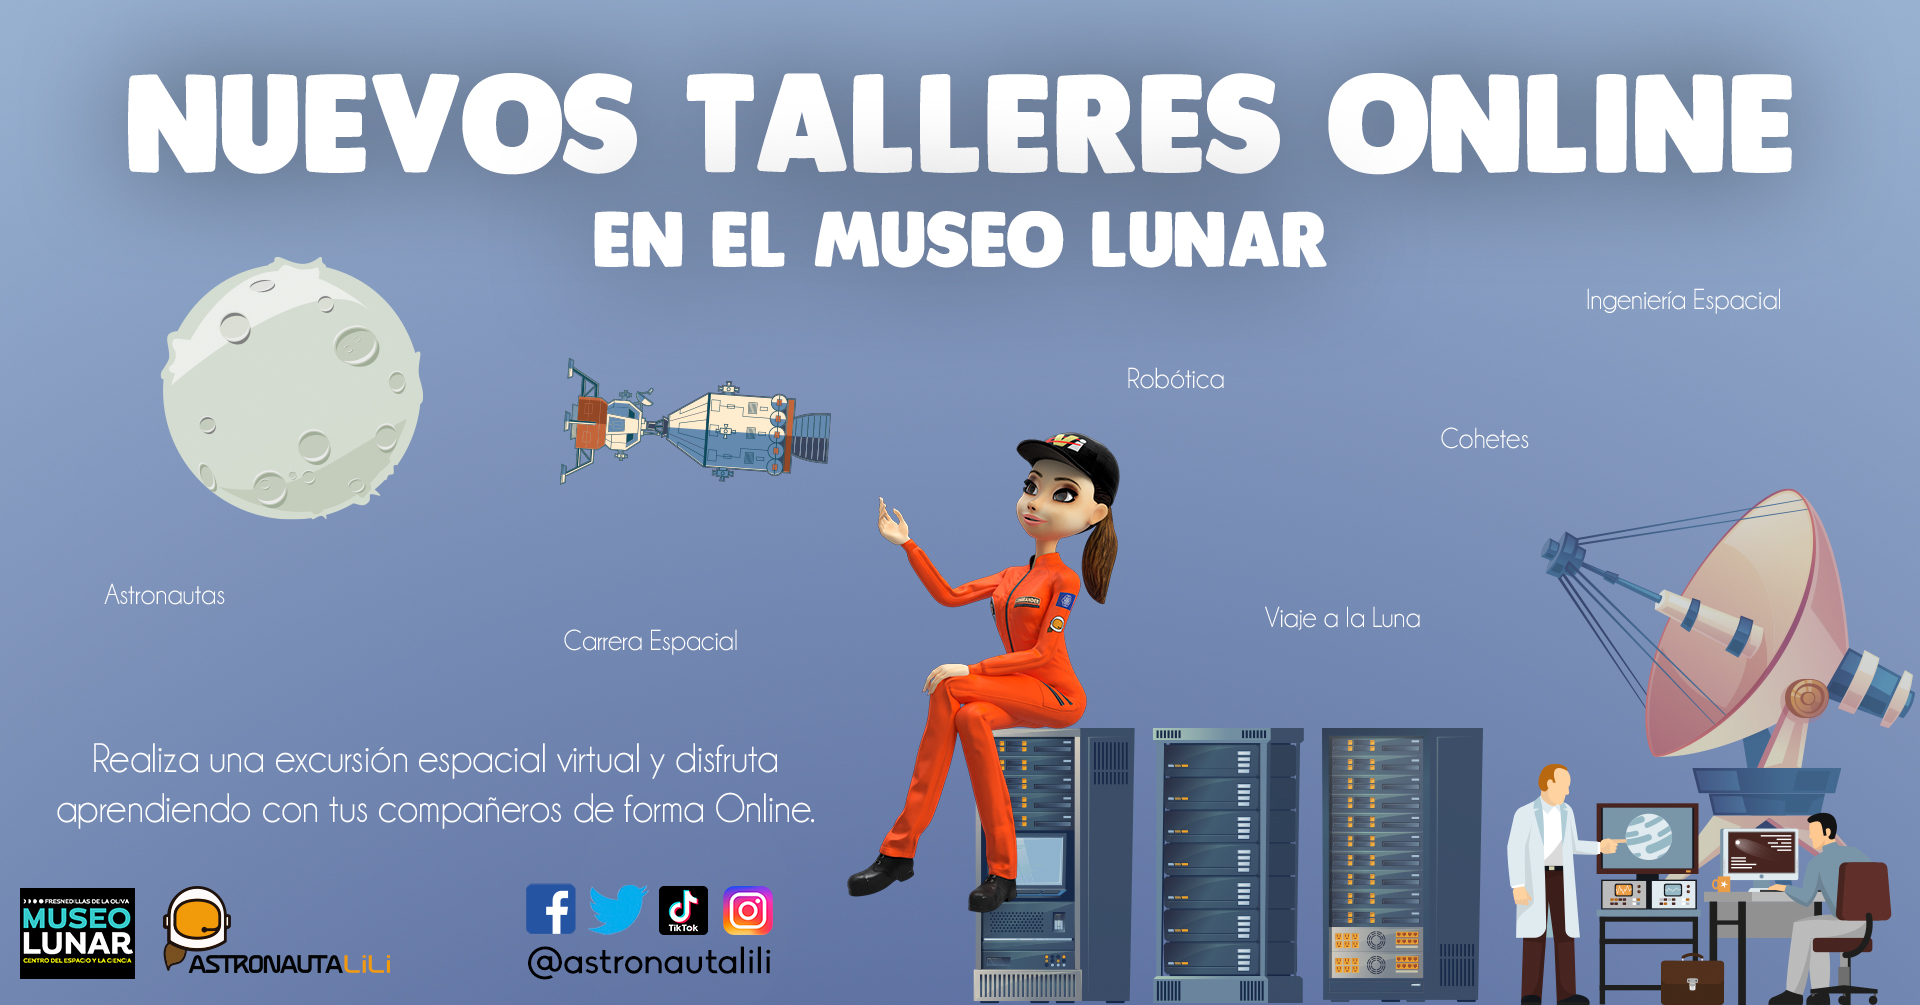 Museo_Lunar_taller_online_astronauta_lili_excursion_Virtual